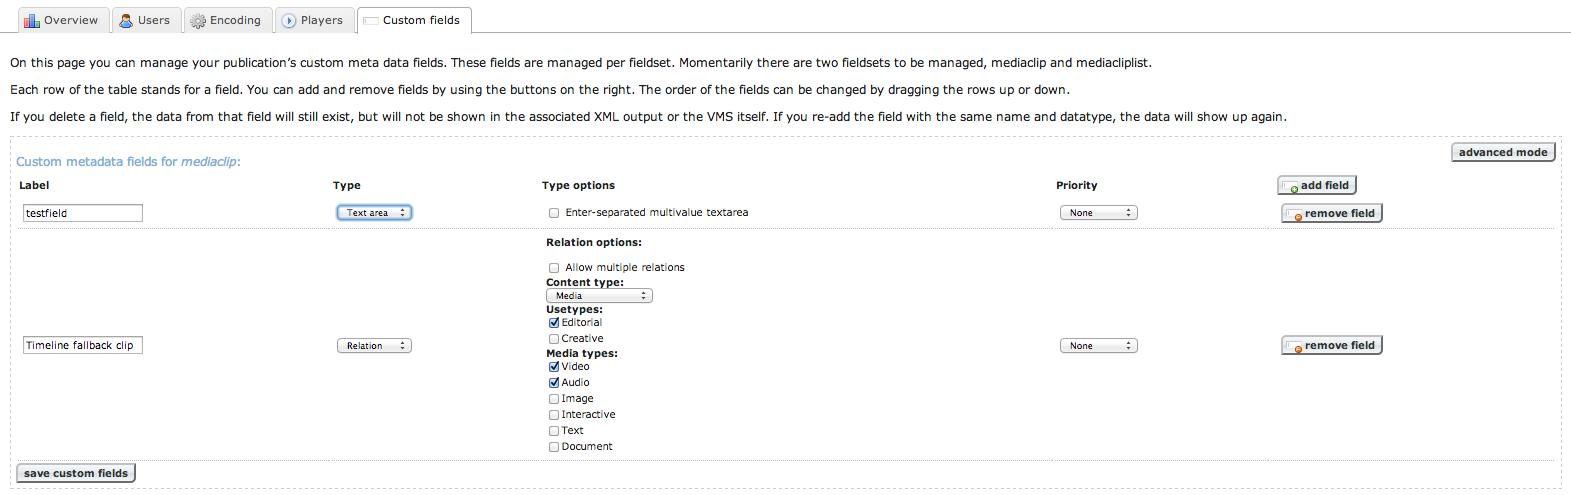 Custom fields tab